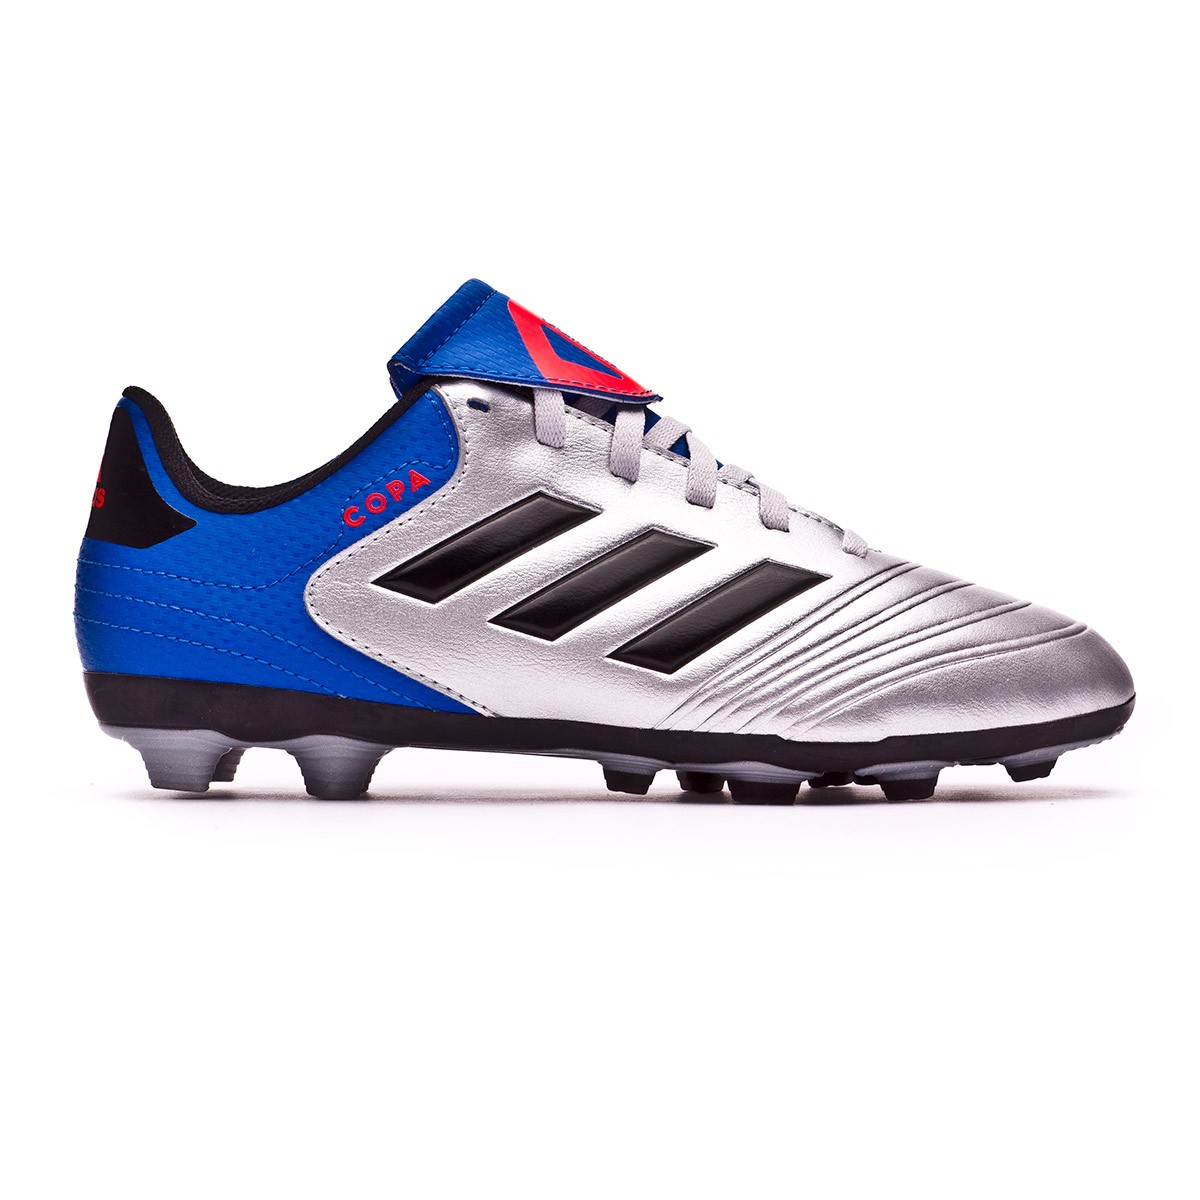 0f05ae7330b22 Boot adidas Kids Copa 18.4 FxG Silver metallic-Core black-Football blue -  Football store Fútbol Emotion